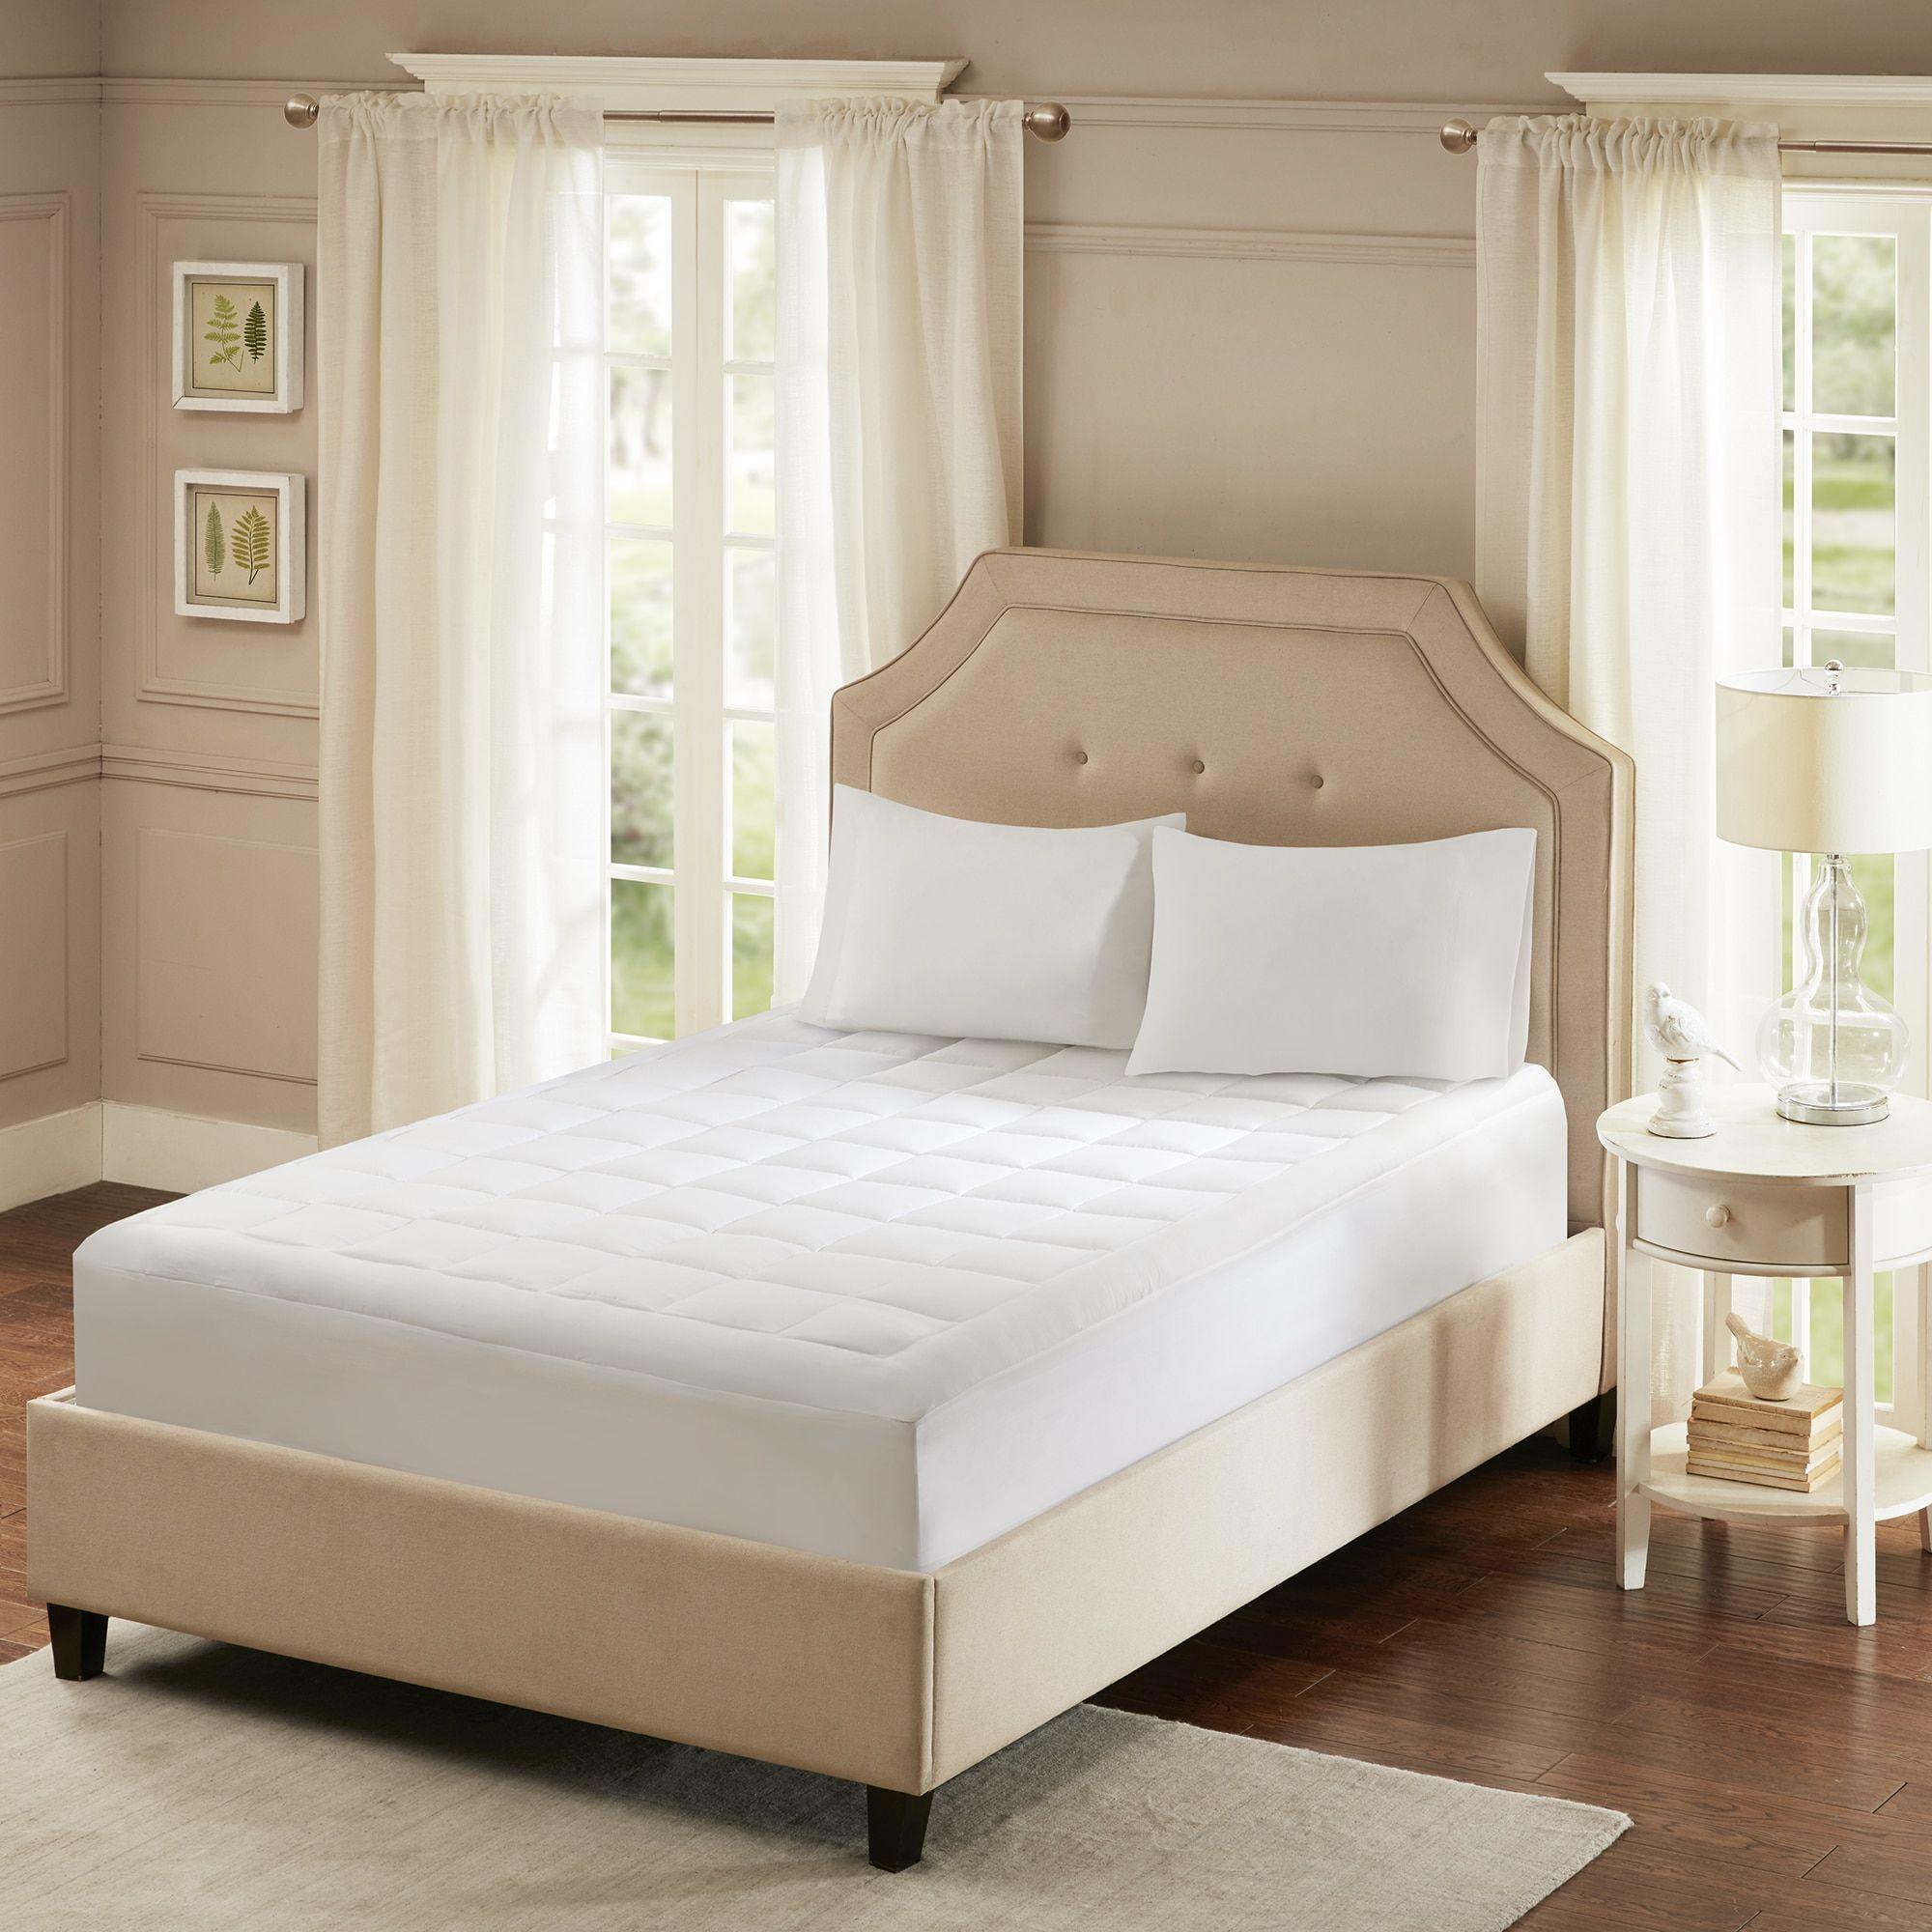 Smart cool by sleep philosophy microfiber white coolmax mattress pad